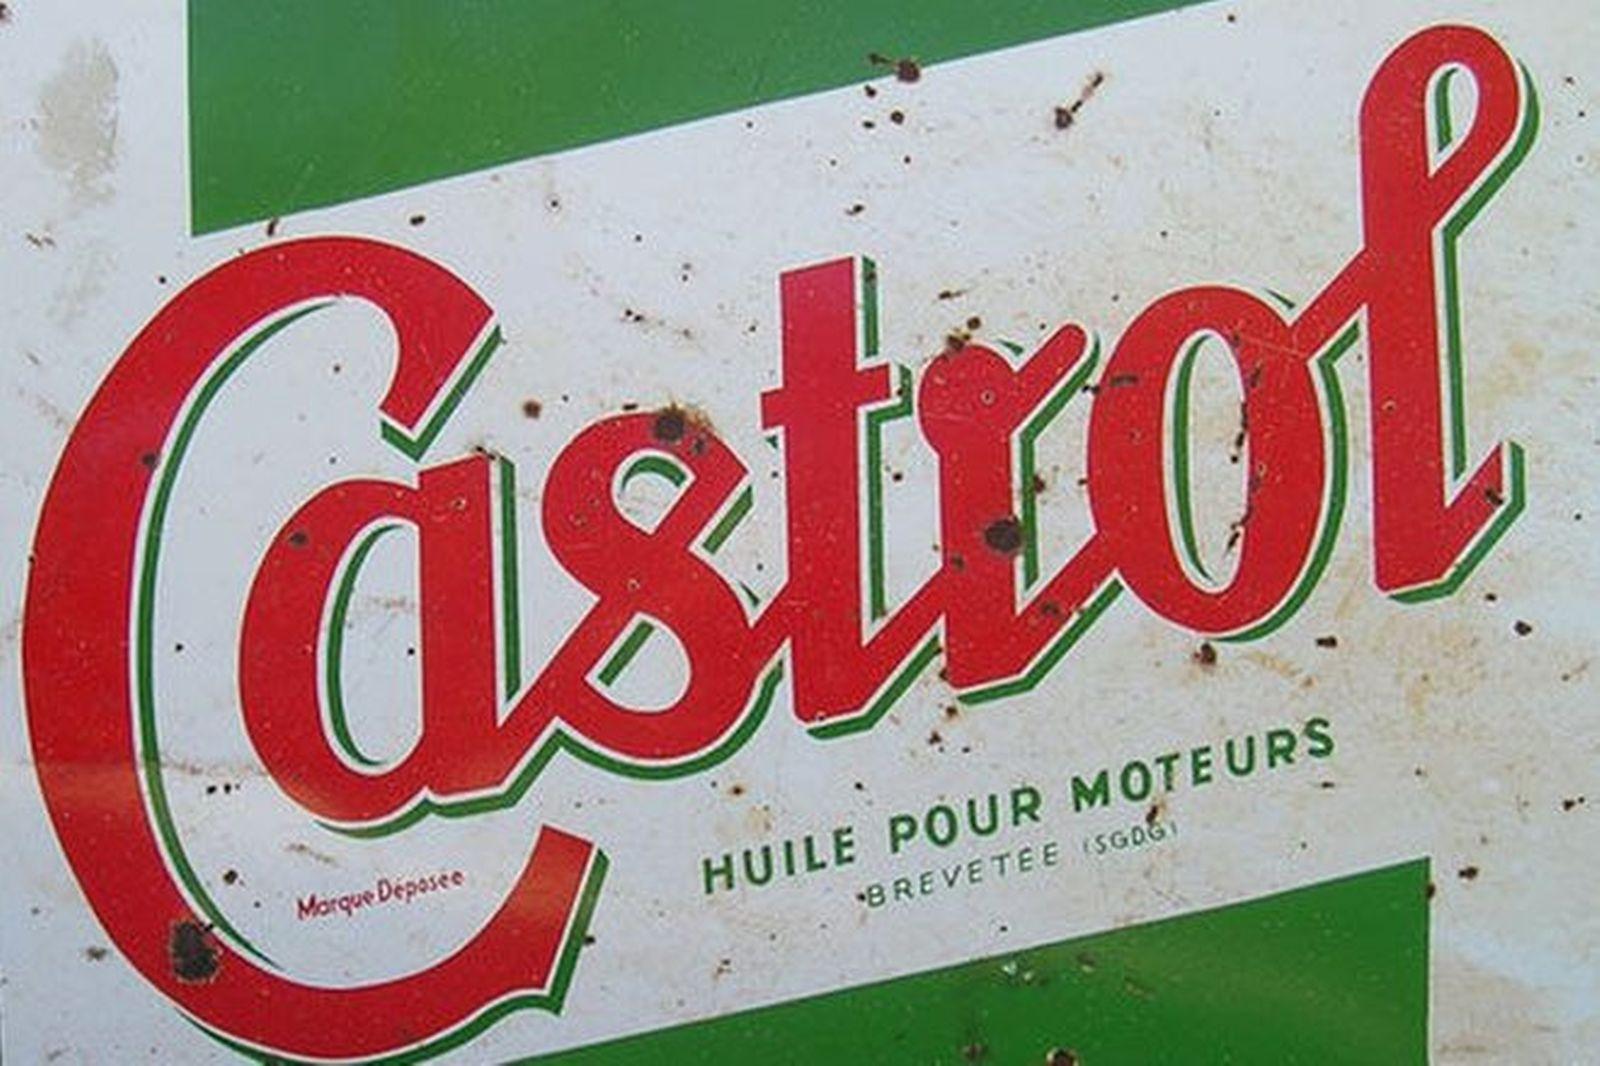 Enamel Sign - Castrol 'Oil for Motors' (4' x 2.5')